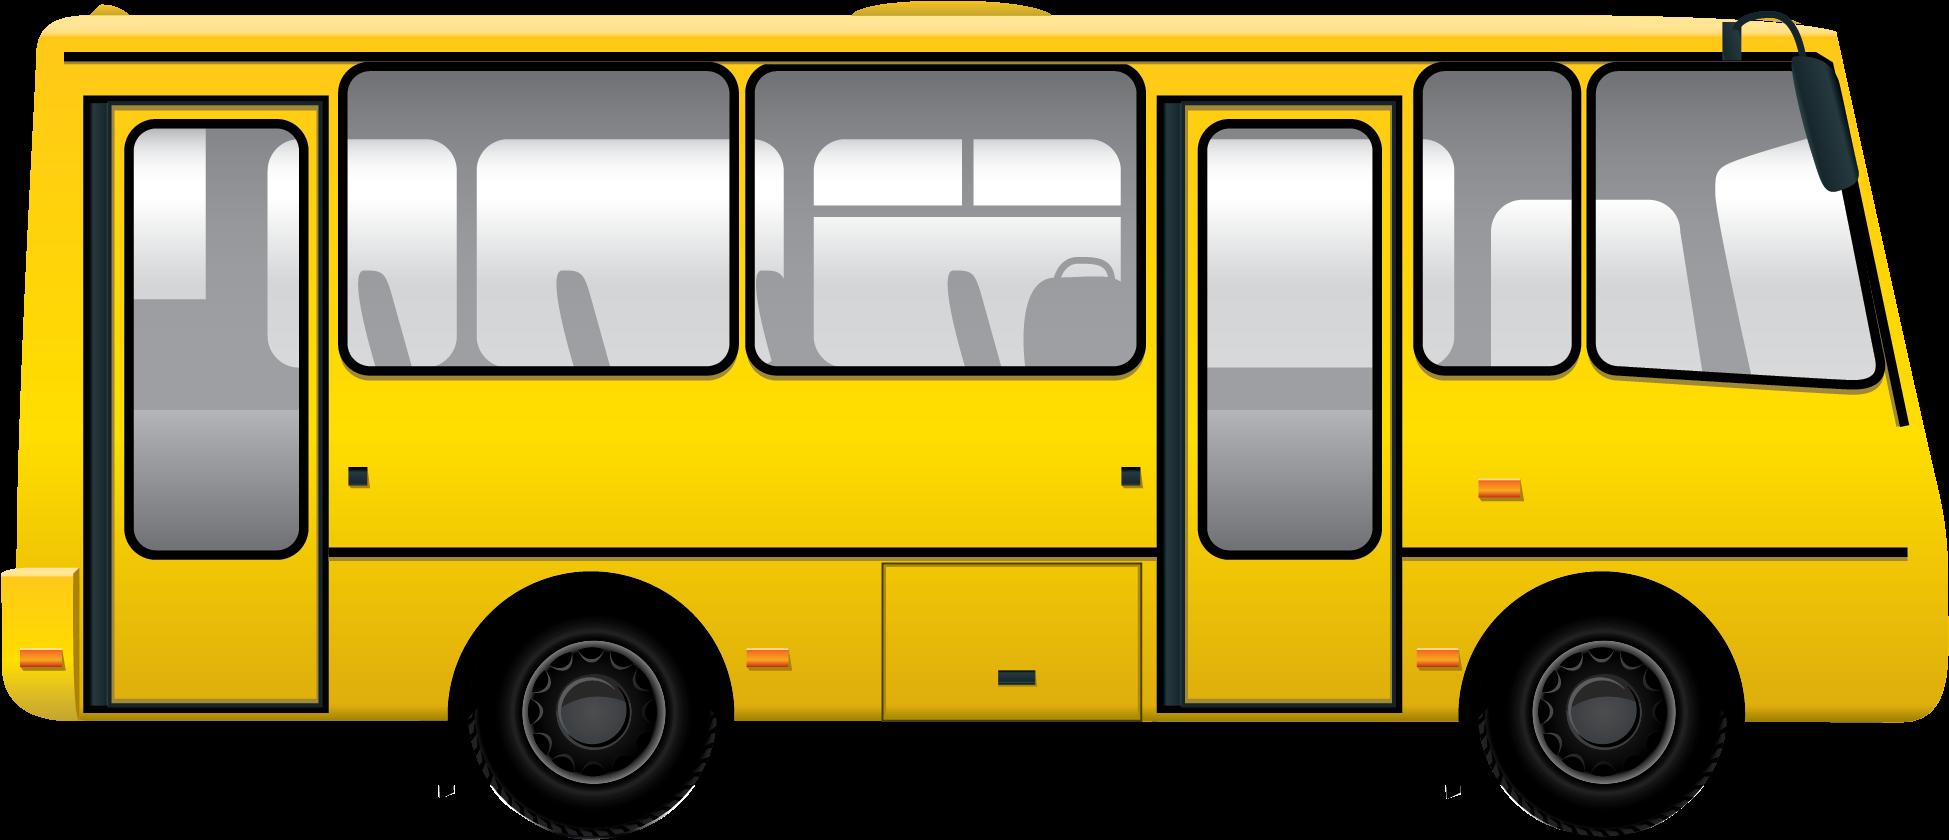 Картинка автобус без фона